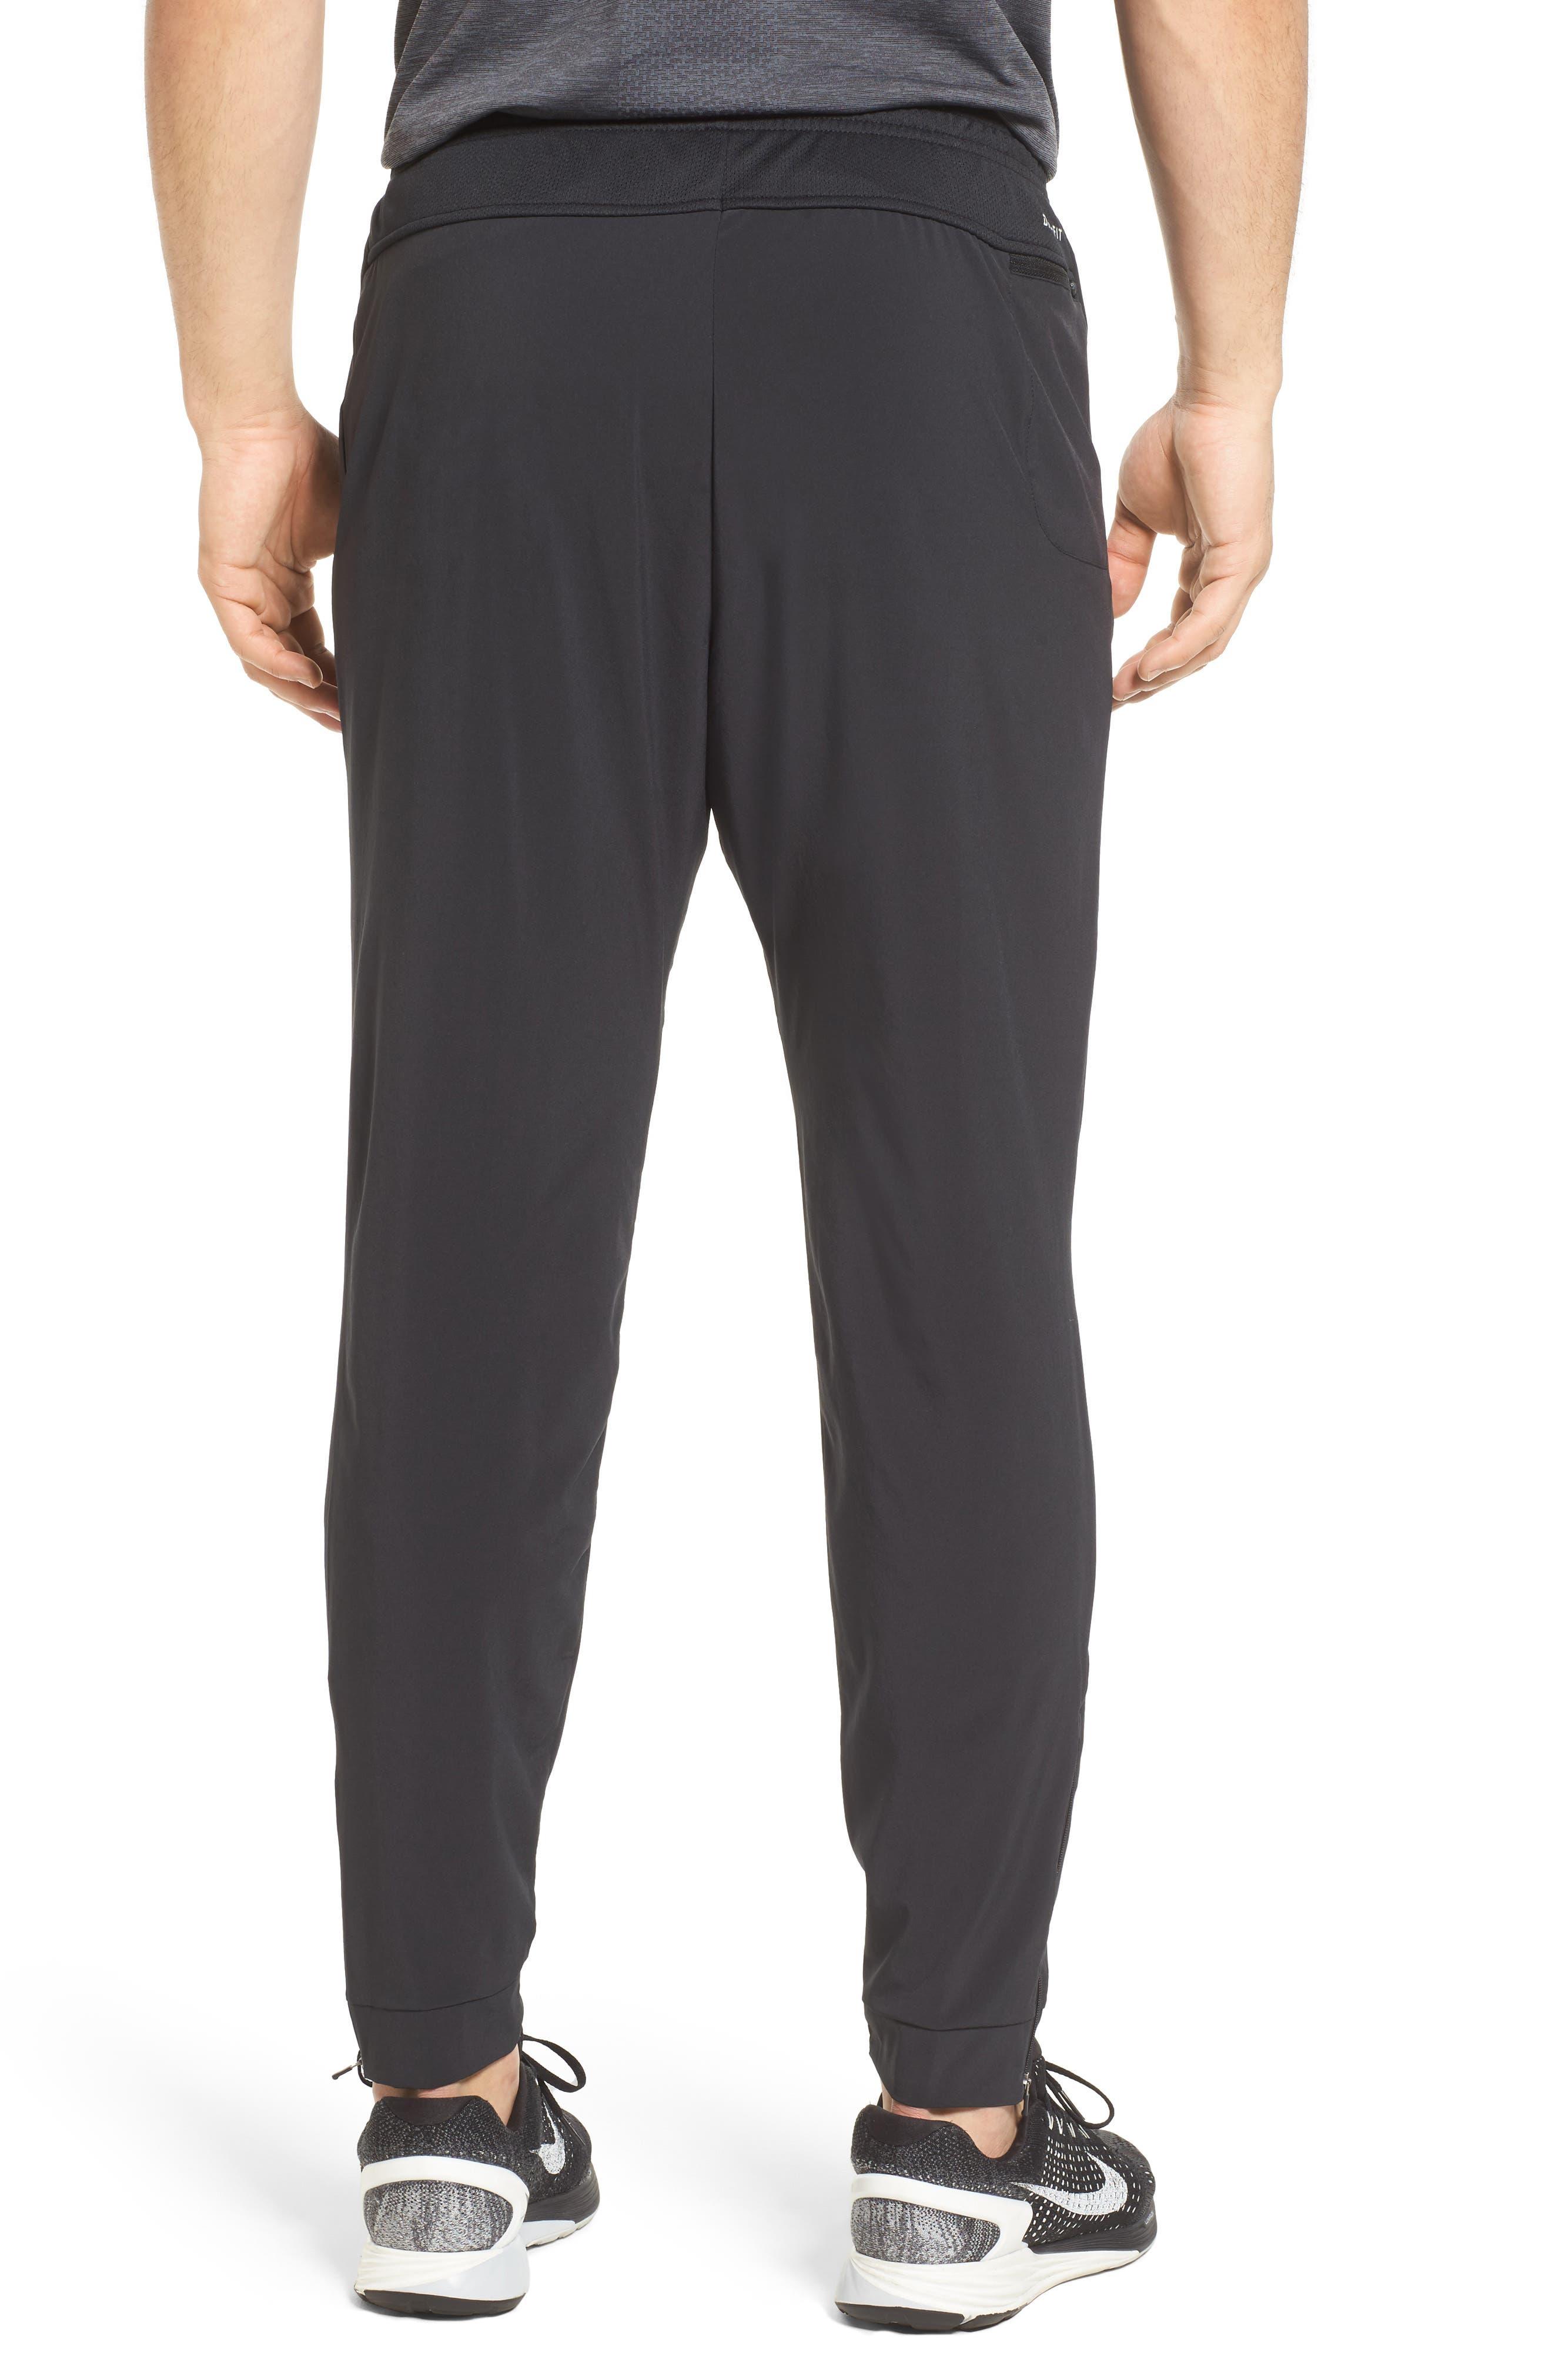 Essential Flex Running Pants,                             Alternate thumbnail 2, color,                             Black